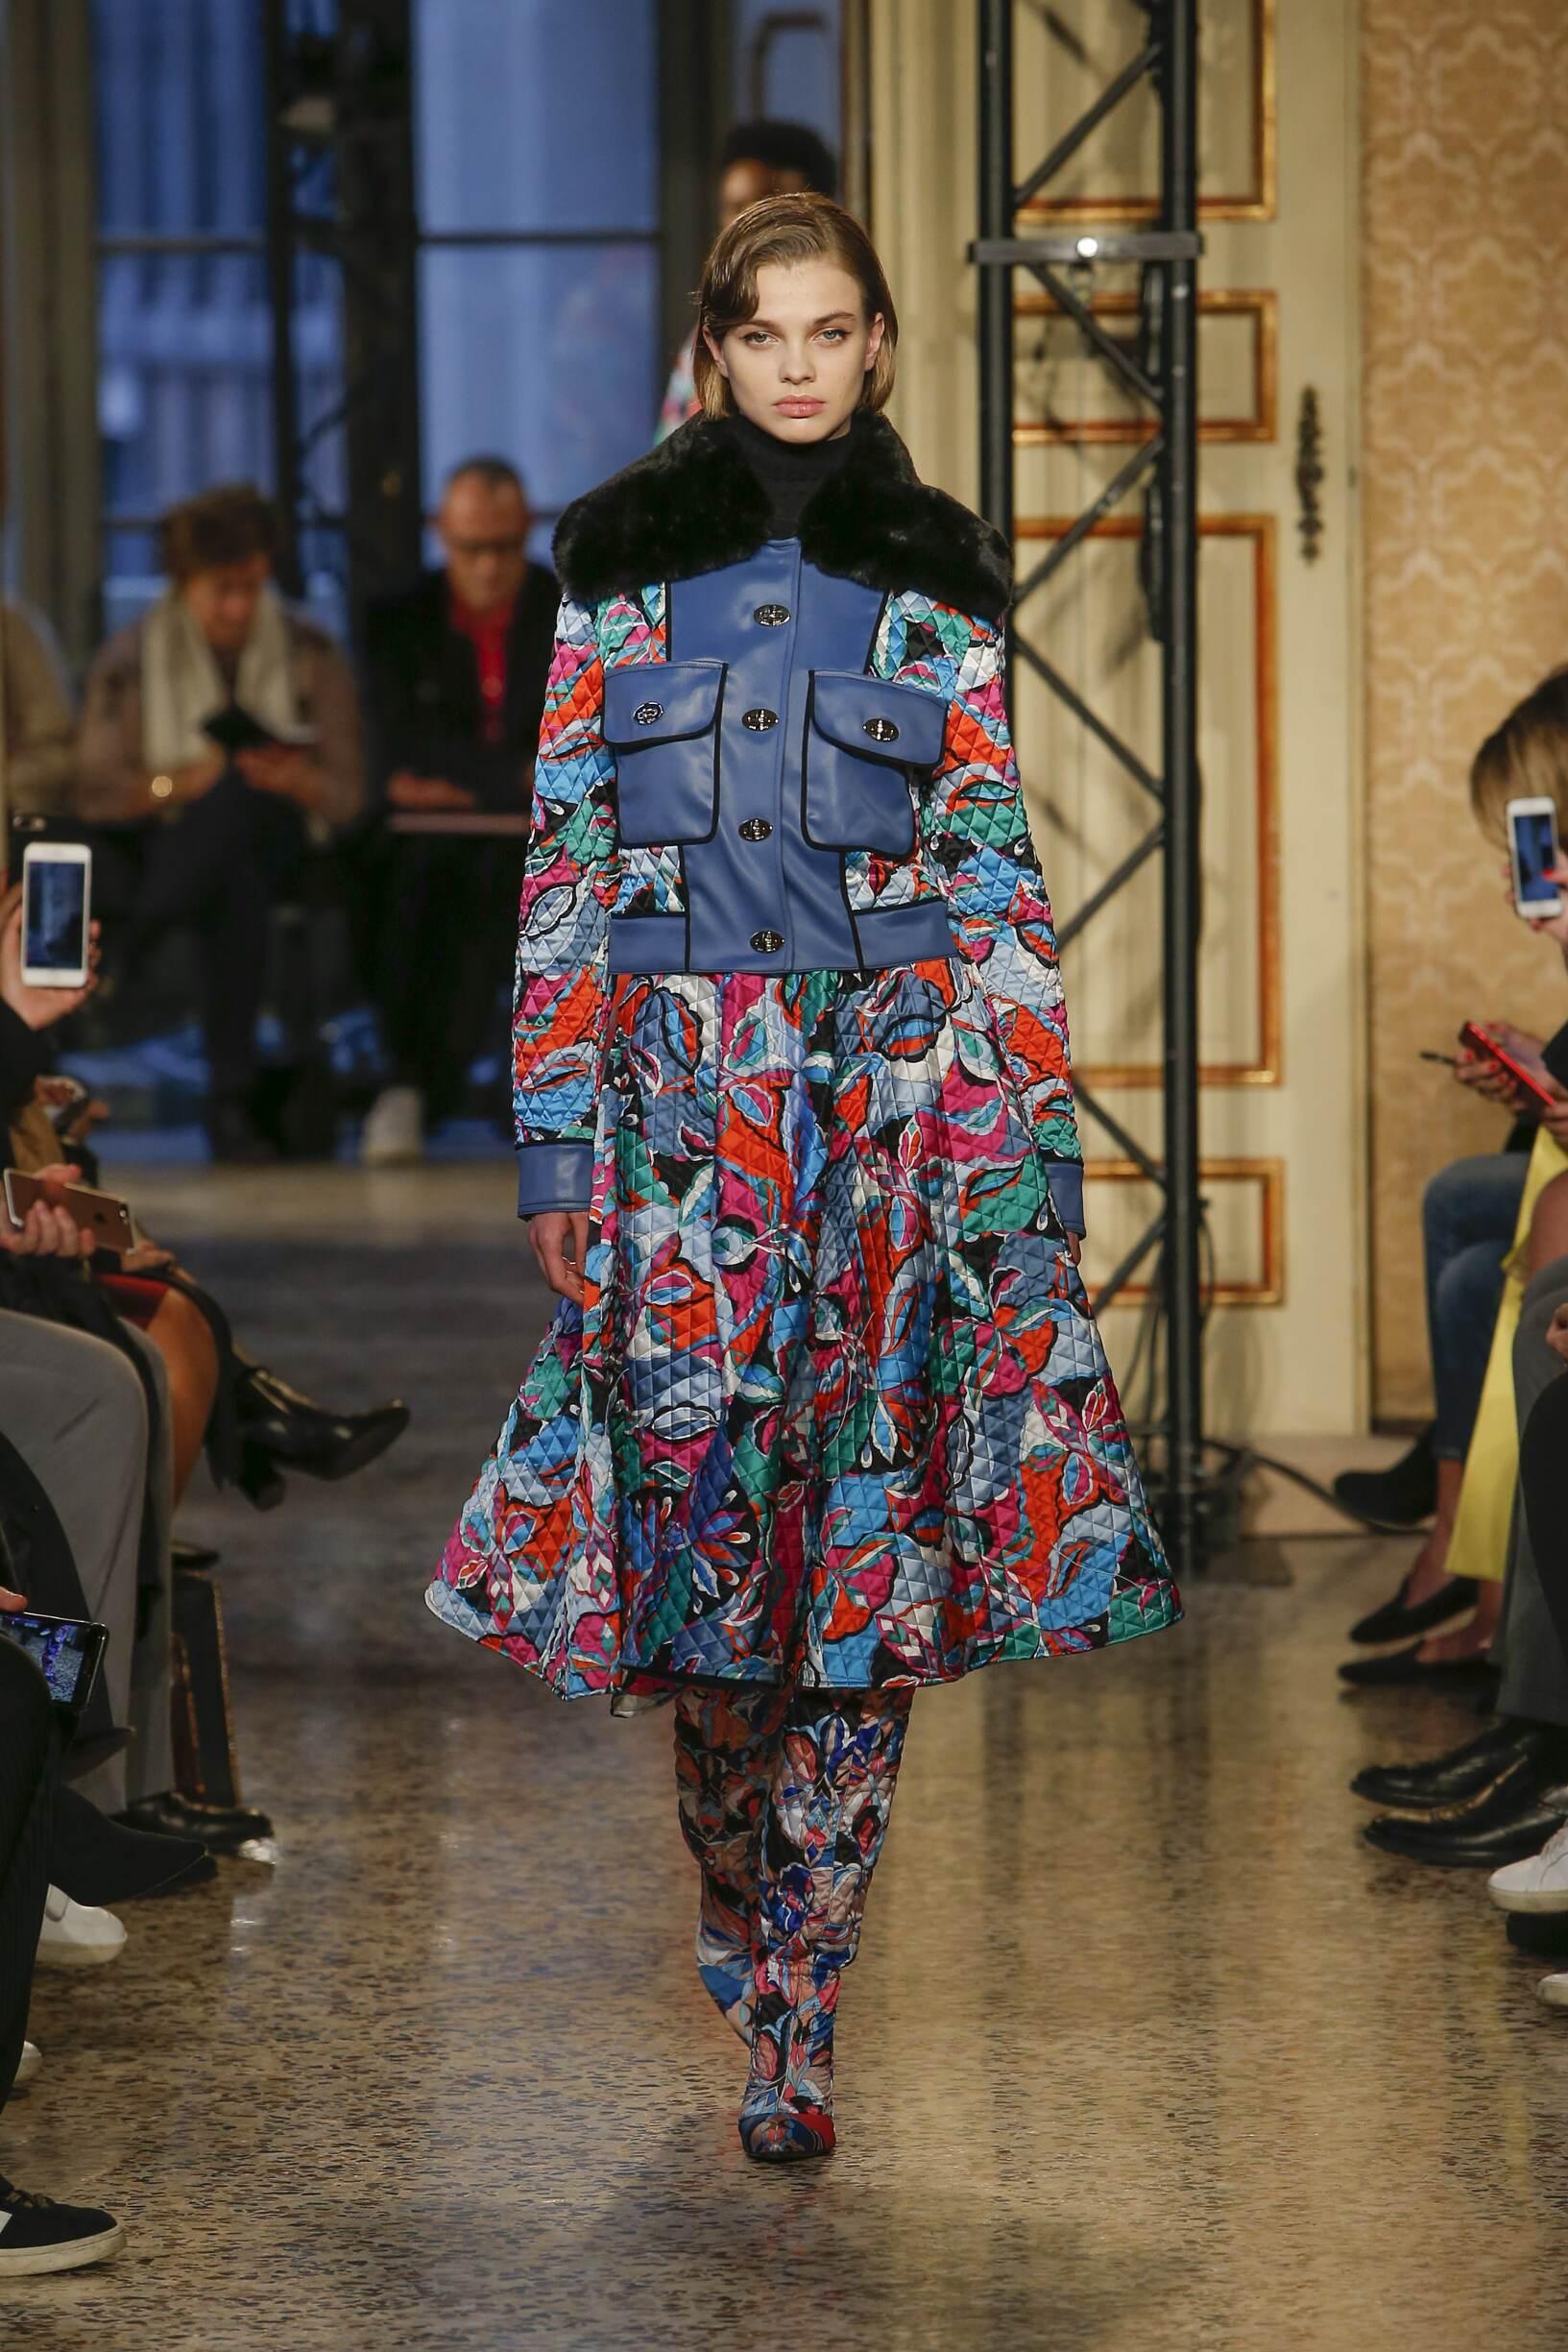 Runway Emilio Pucci Fall Winter 2018 Women's Collection Milan Fashion Week